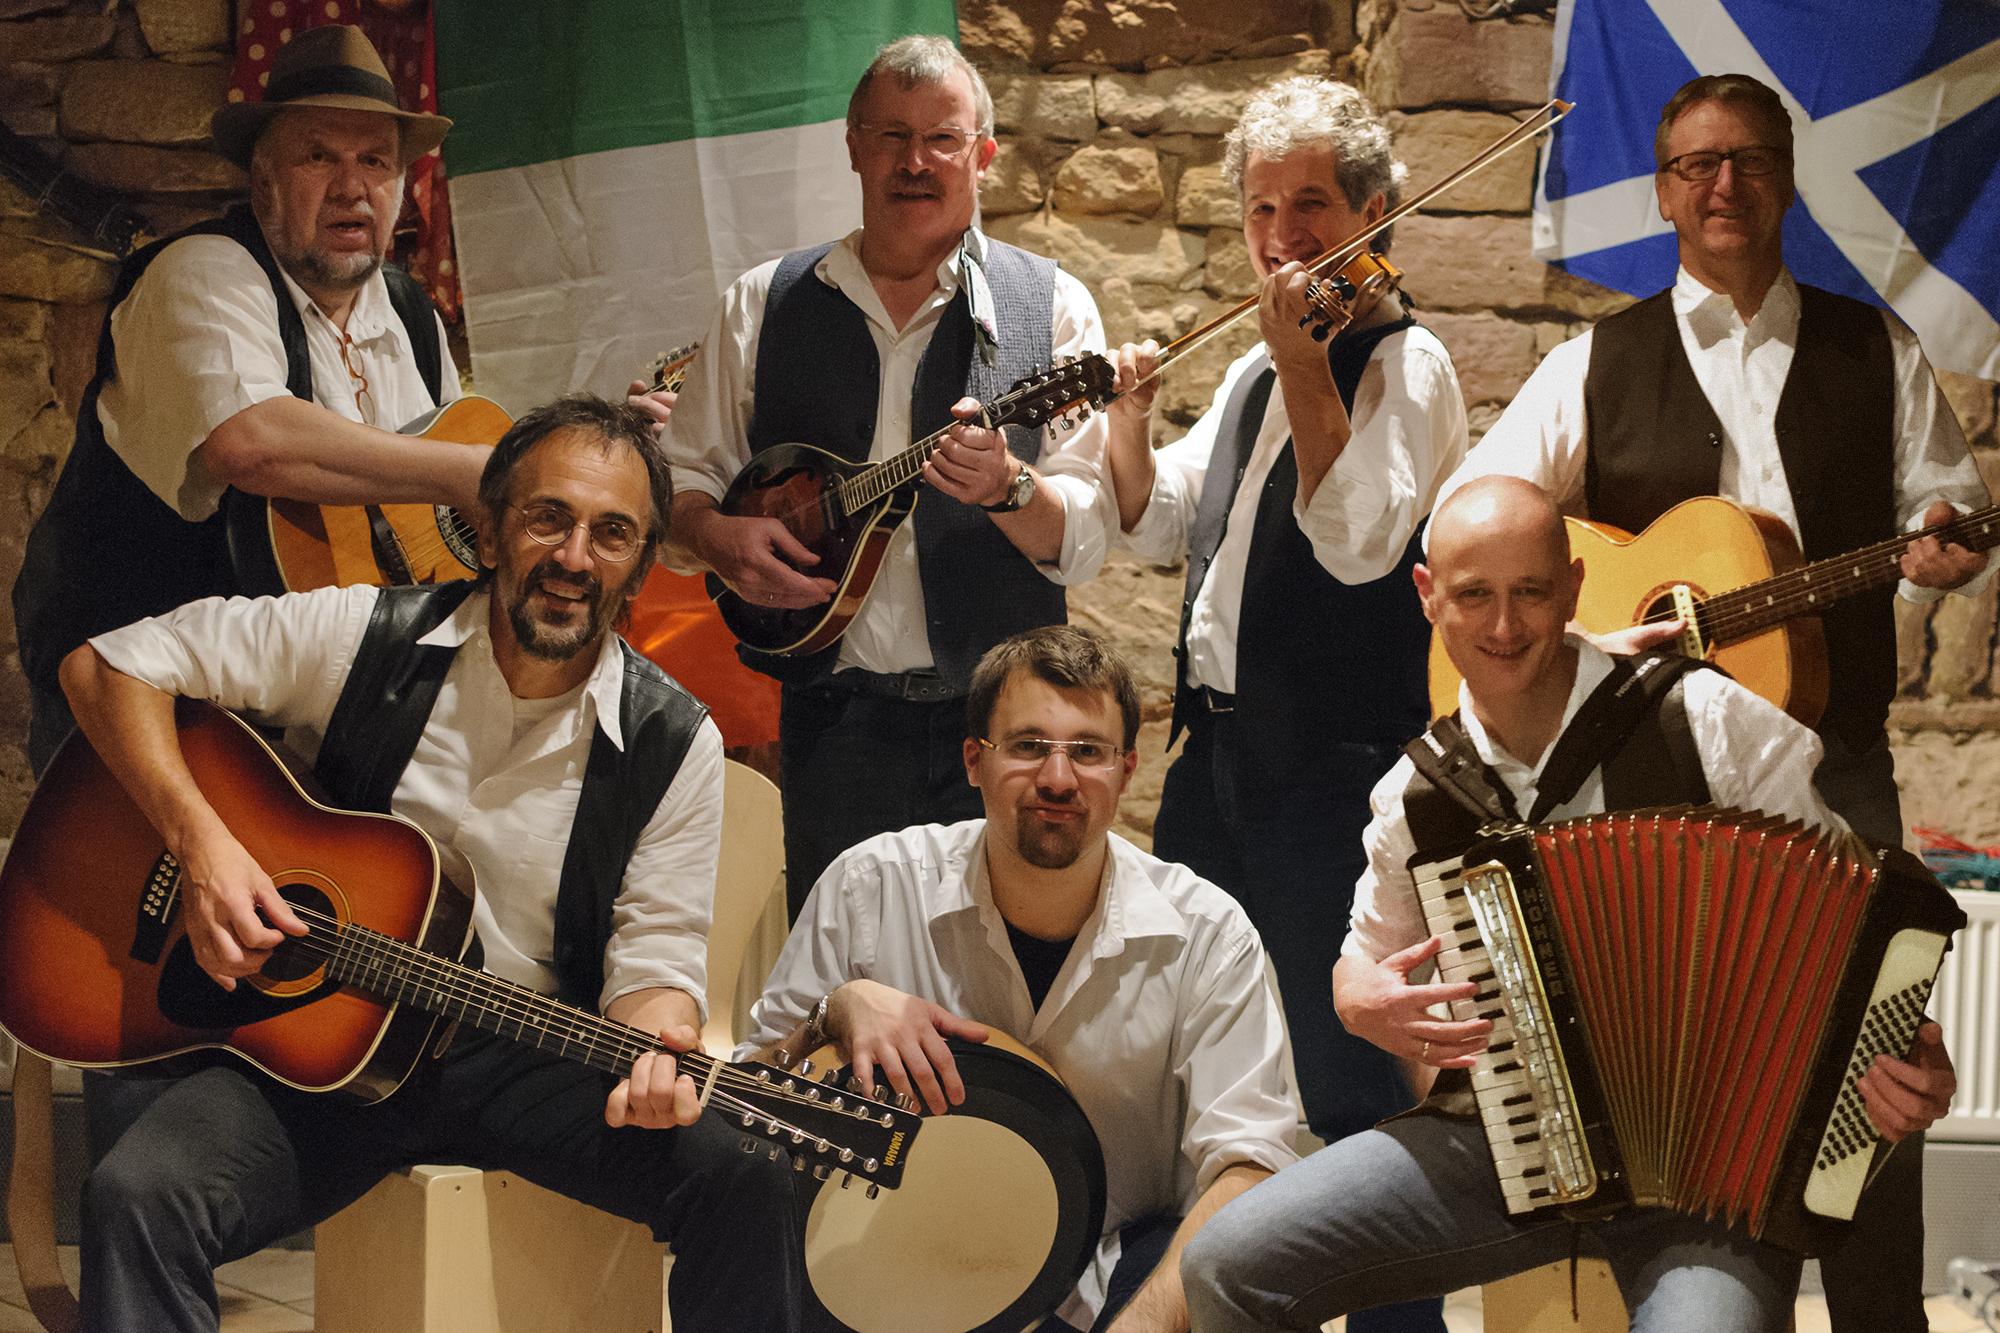 Folkowe mit den Irish Boys